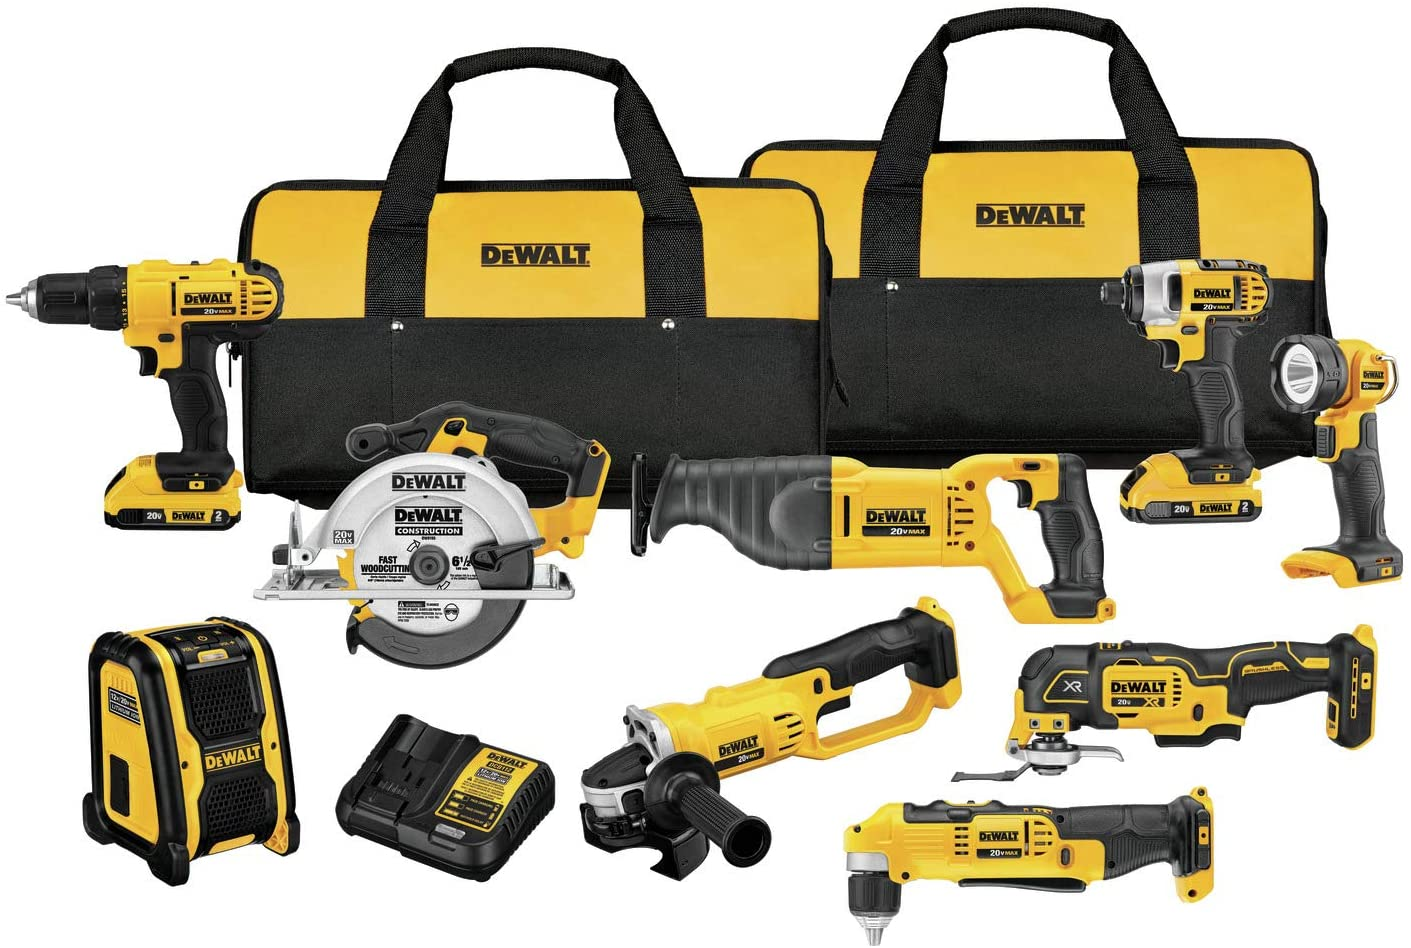 dewalt 9-piece power tool set